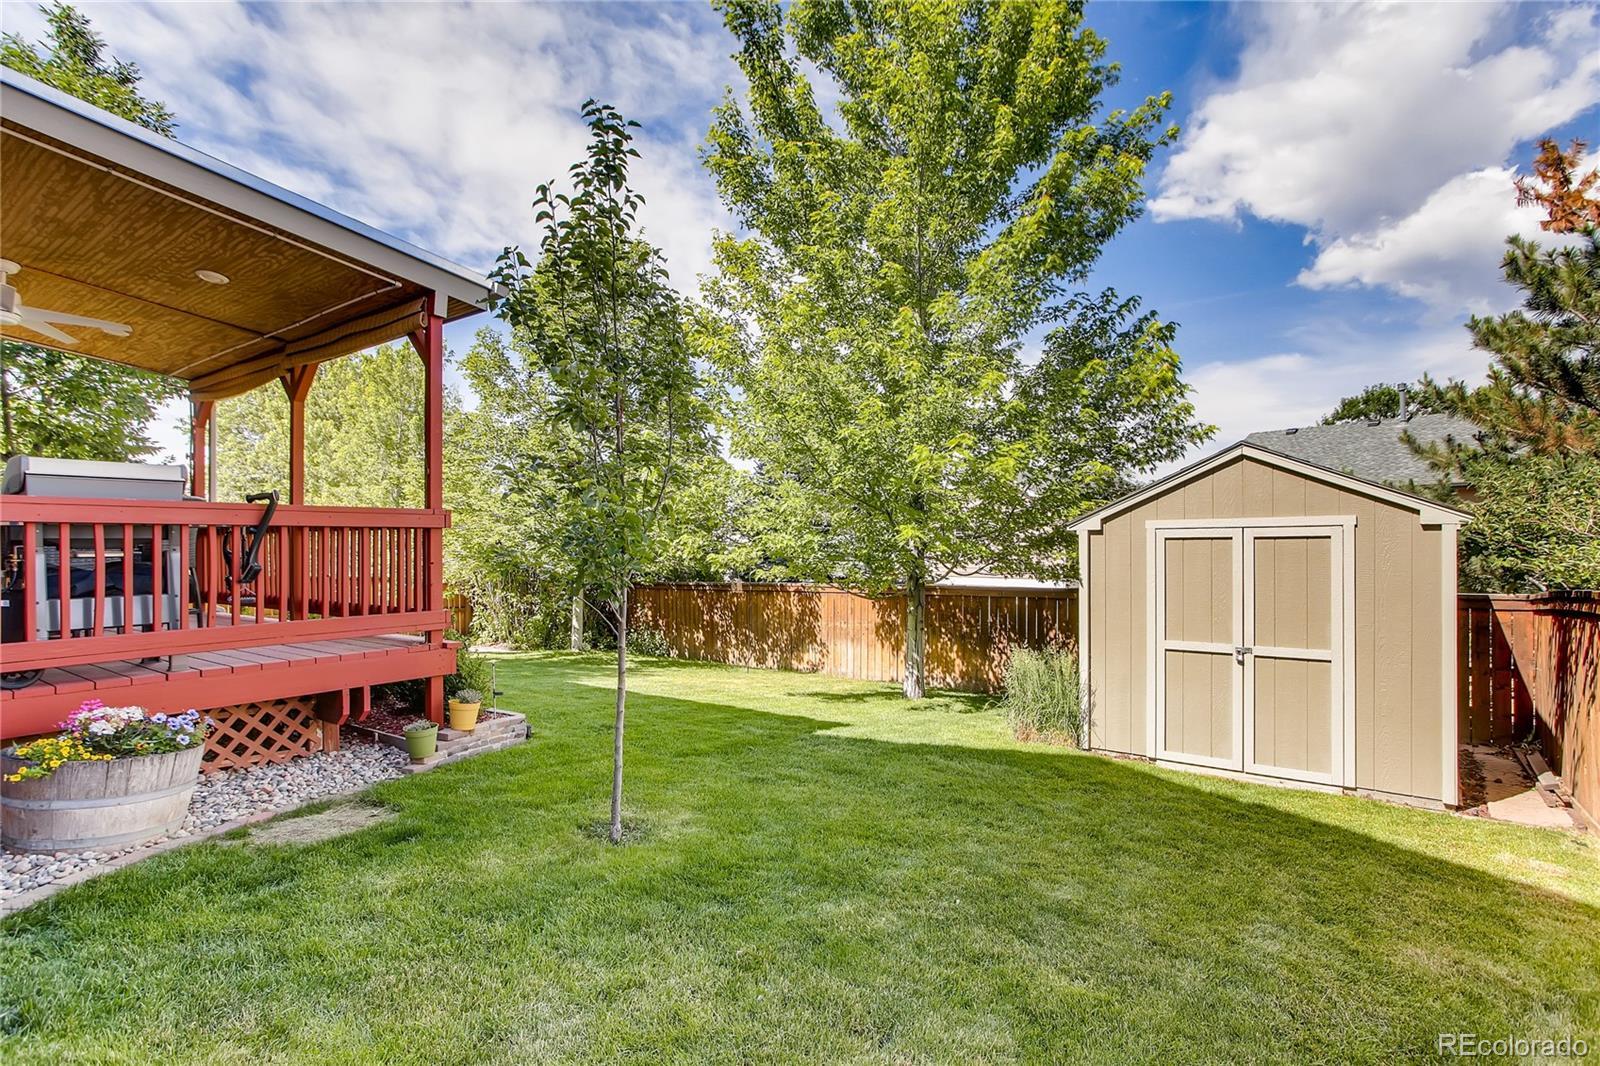 MLS# 8198822 - 25 - 9759 Sun Meadow Street, Highlands Ranch, CO 80129